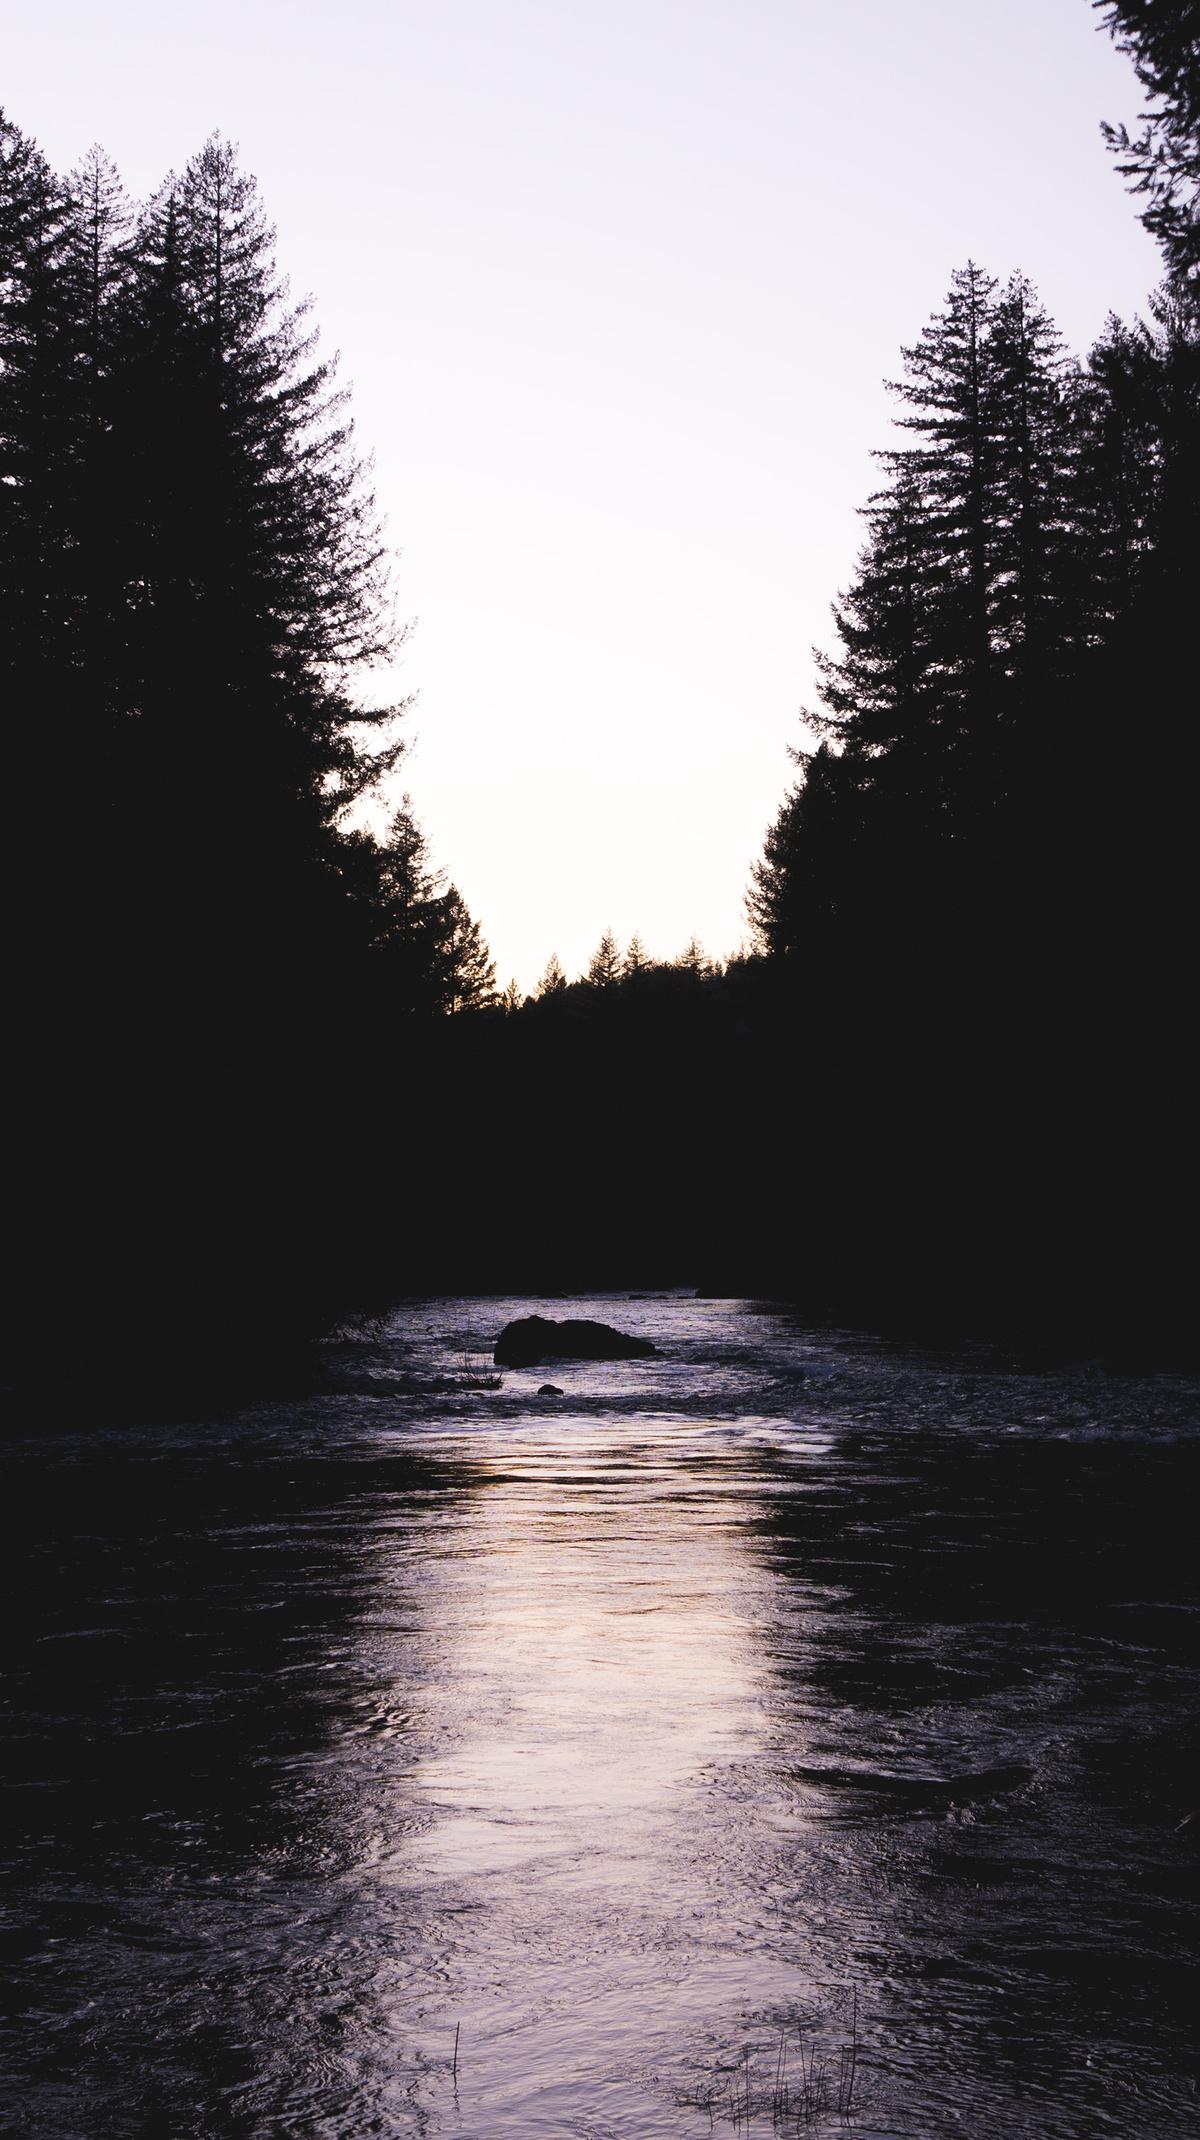 reflected creek